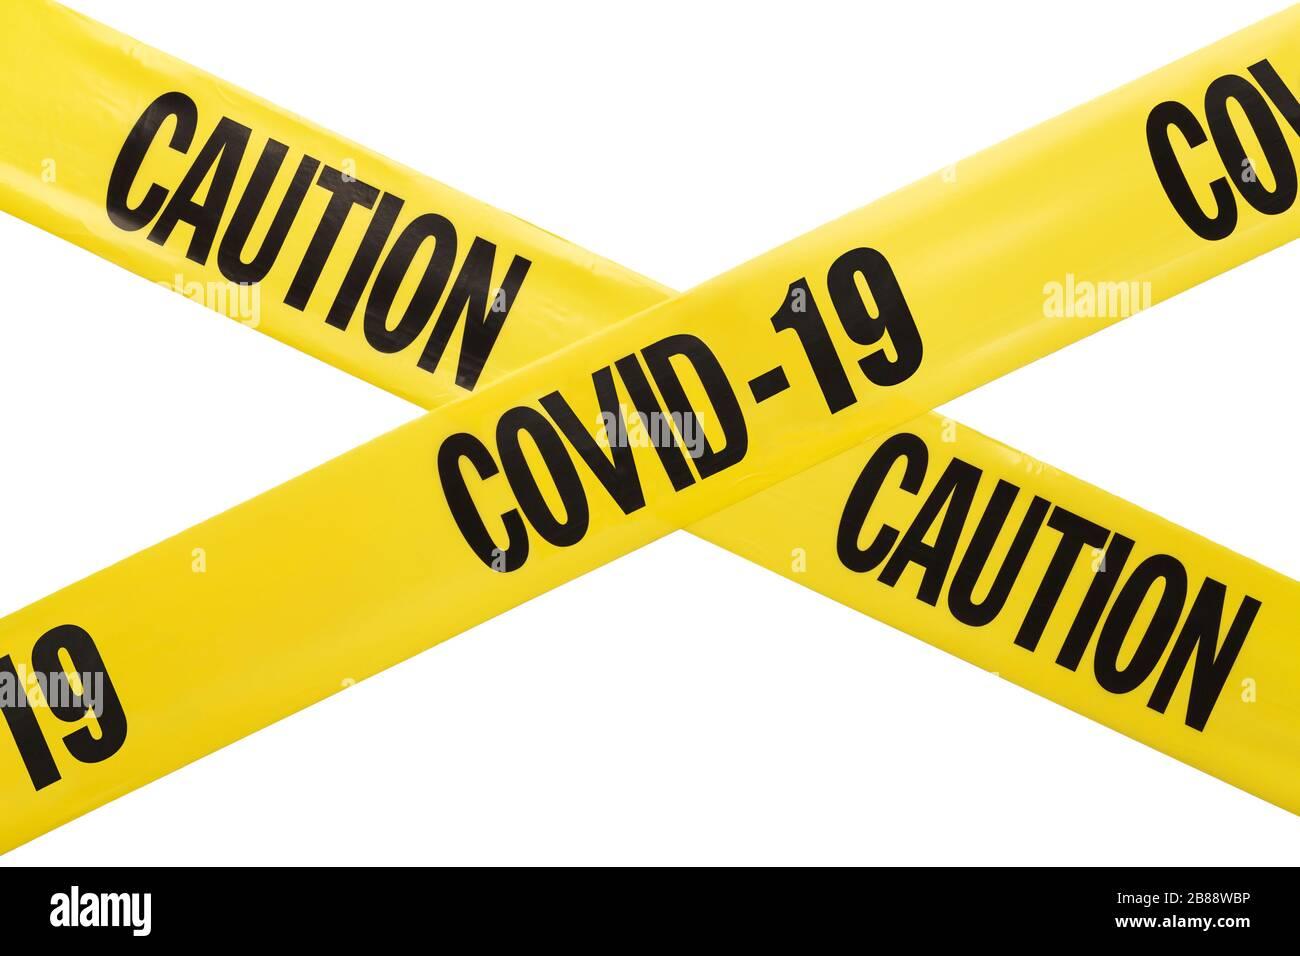 Yellow Plastic Coronavirus Caution Tape Criss Crossing Isolated on White Background. Stock Photo